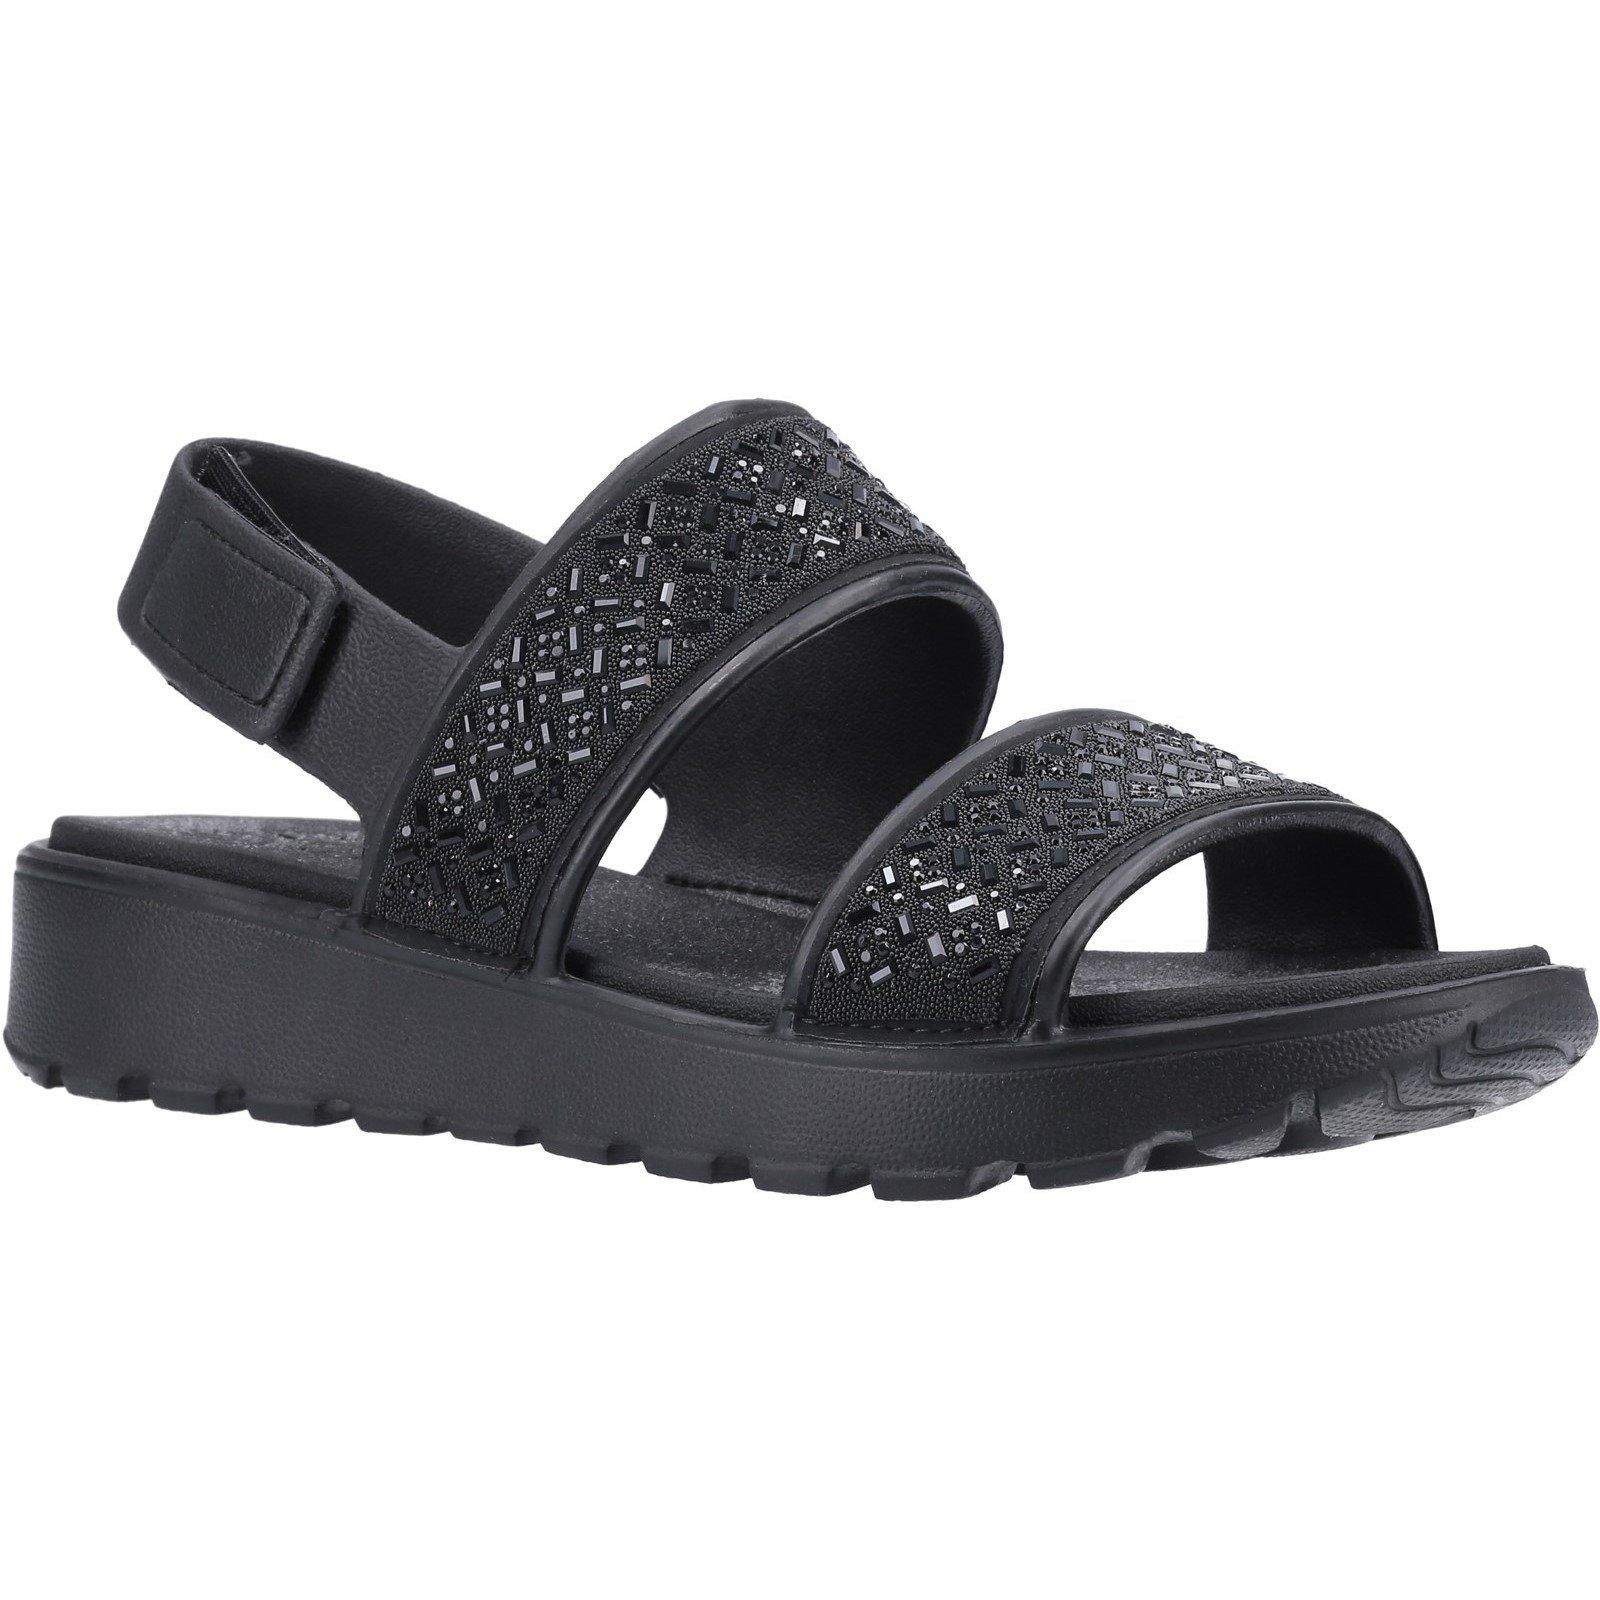 Skechers Women's Footsteps Glam Party Sandal Black 32369 - Black 6